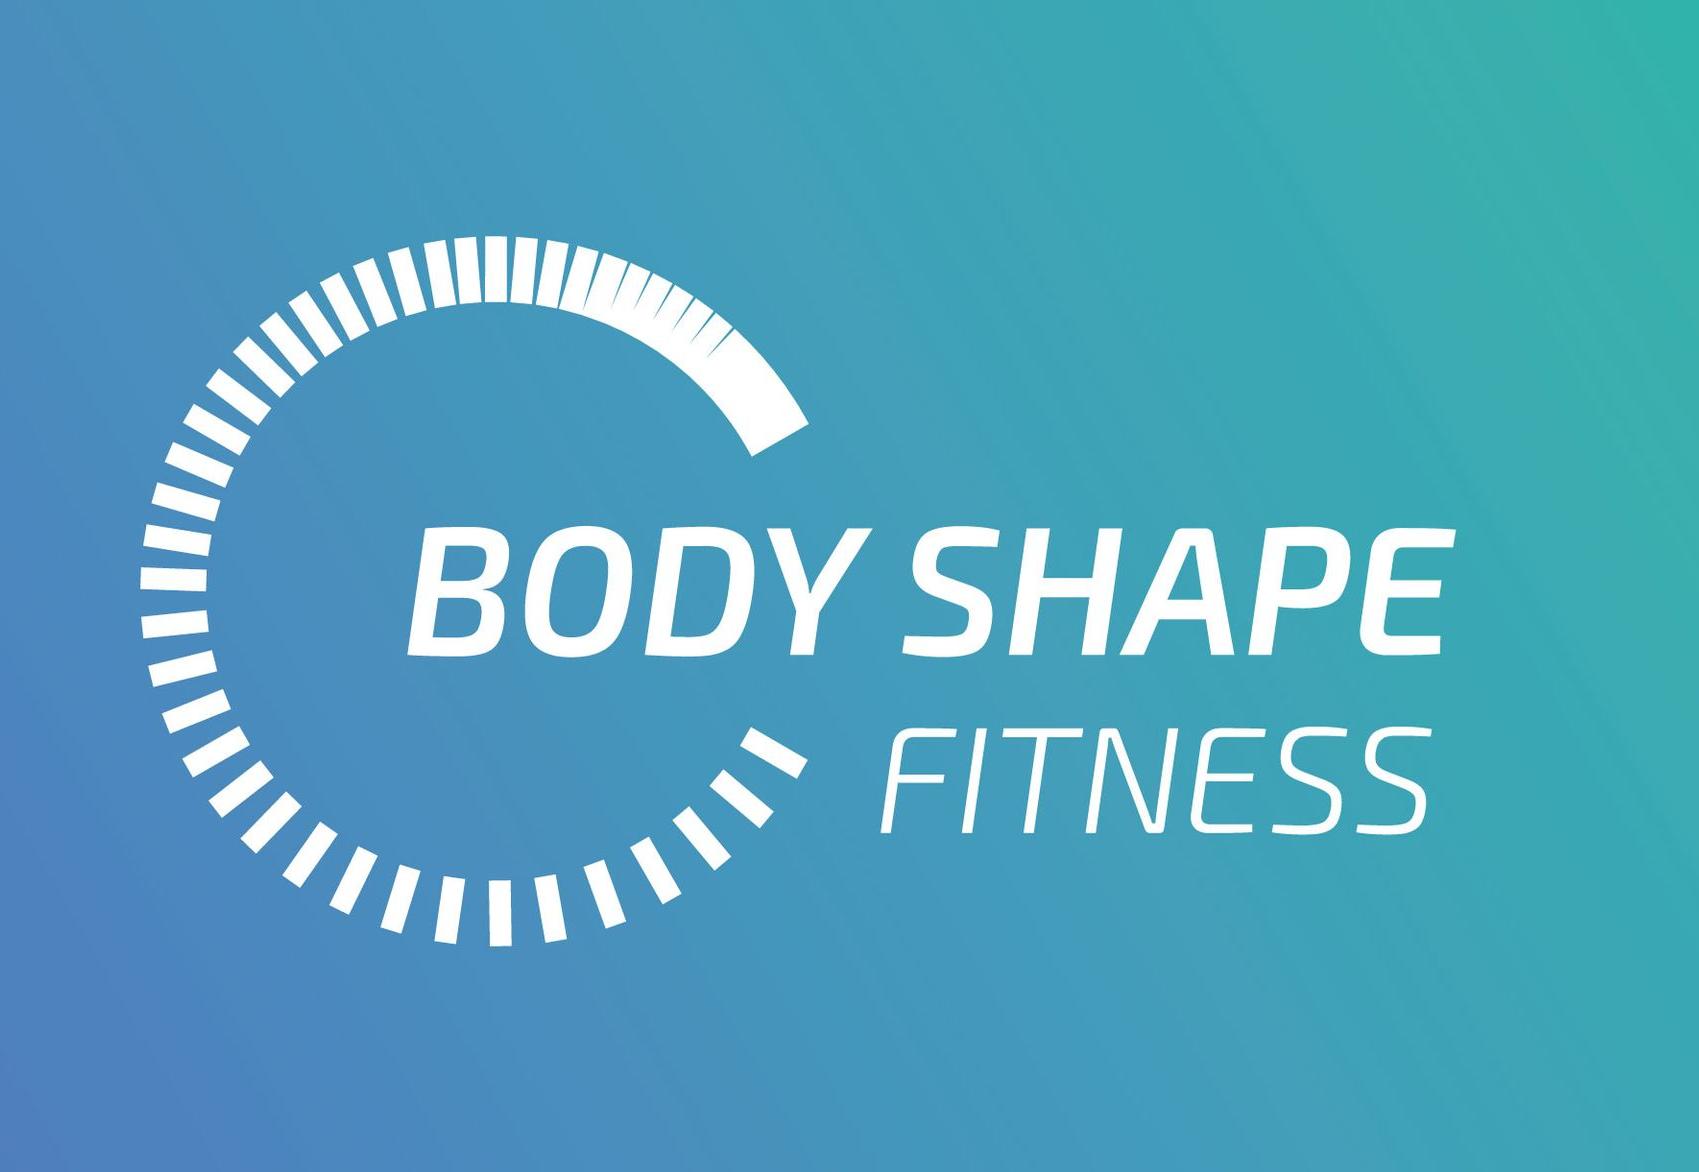 Body Shape Fitness